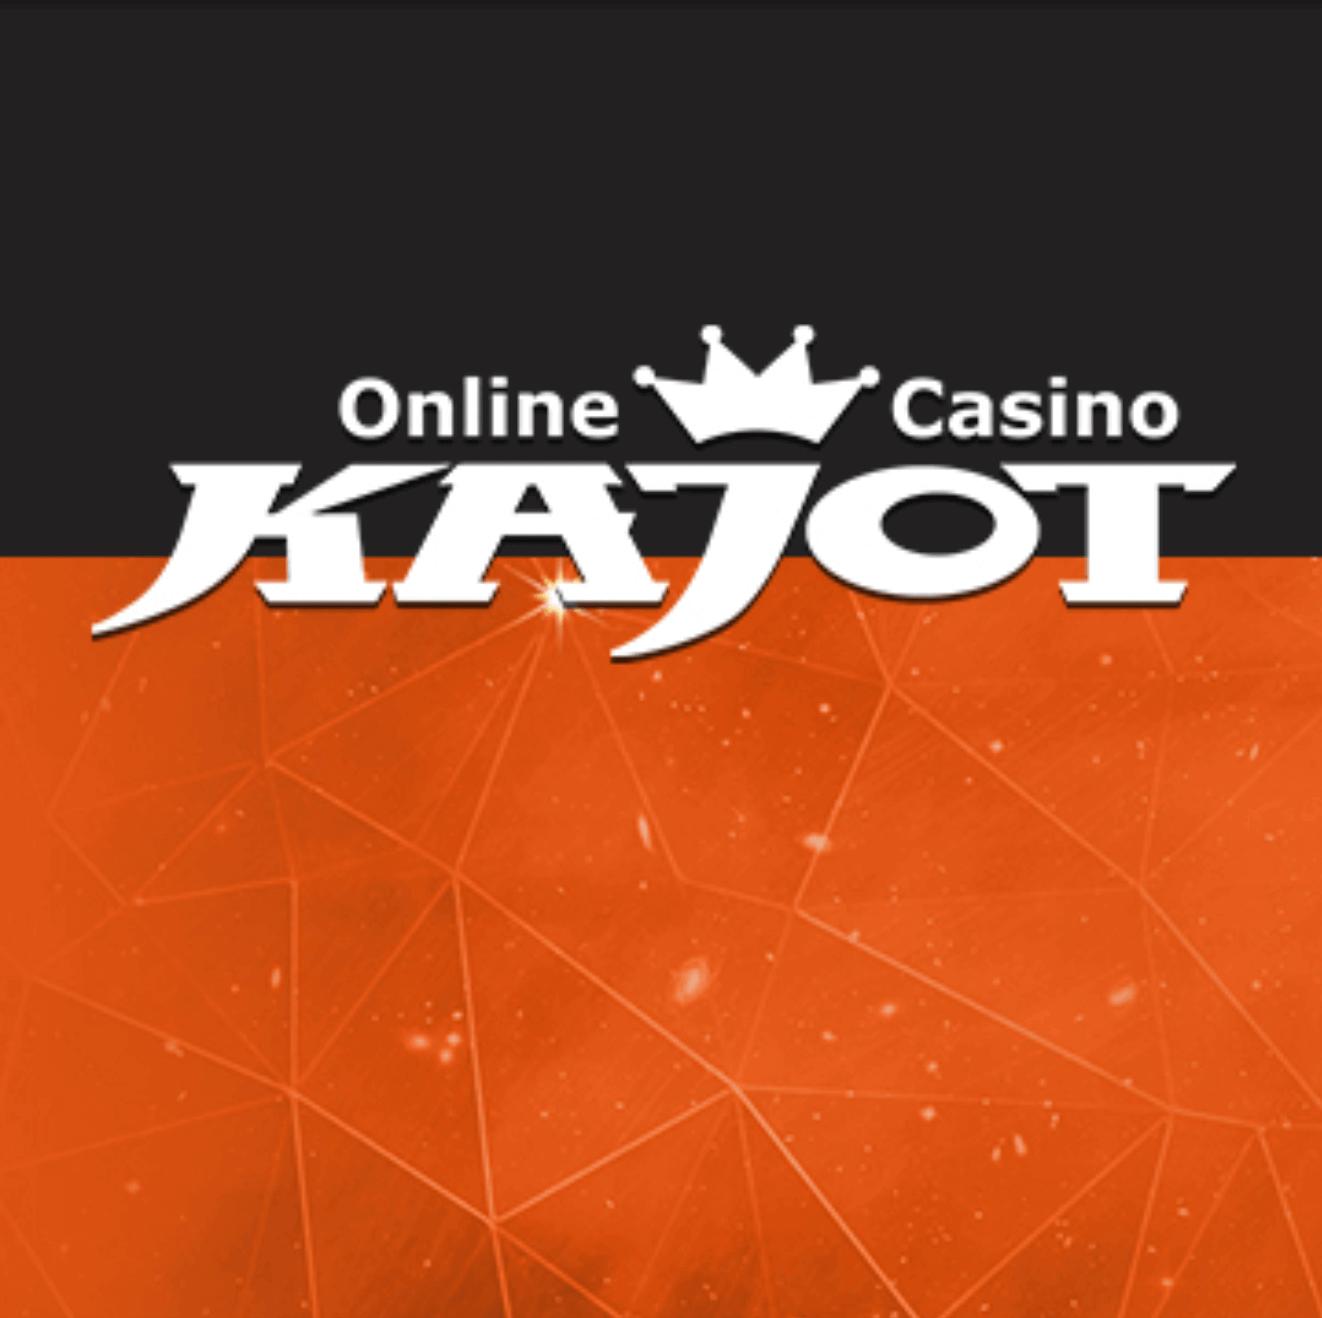 21 dukes casino mobile